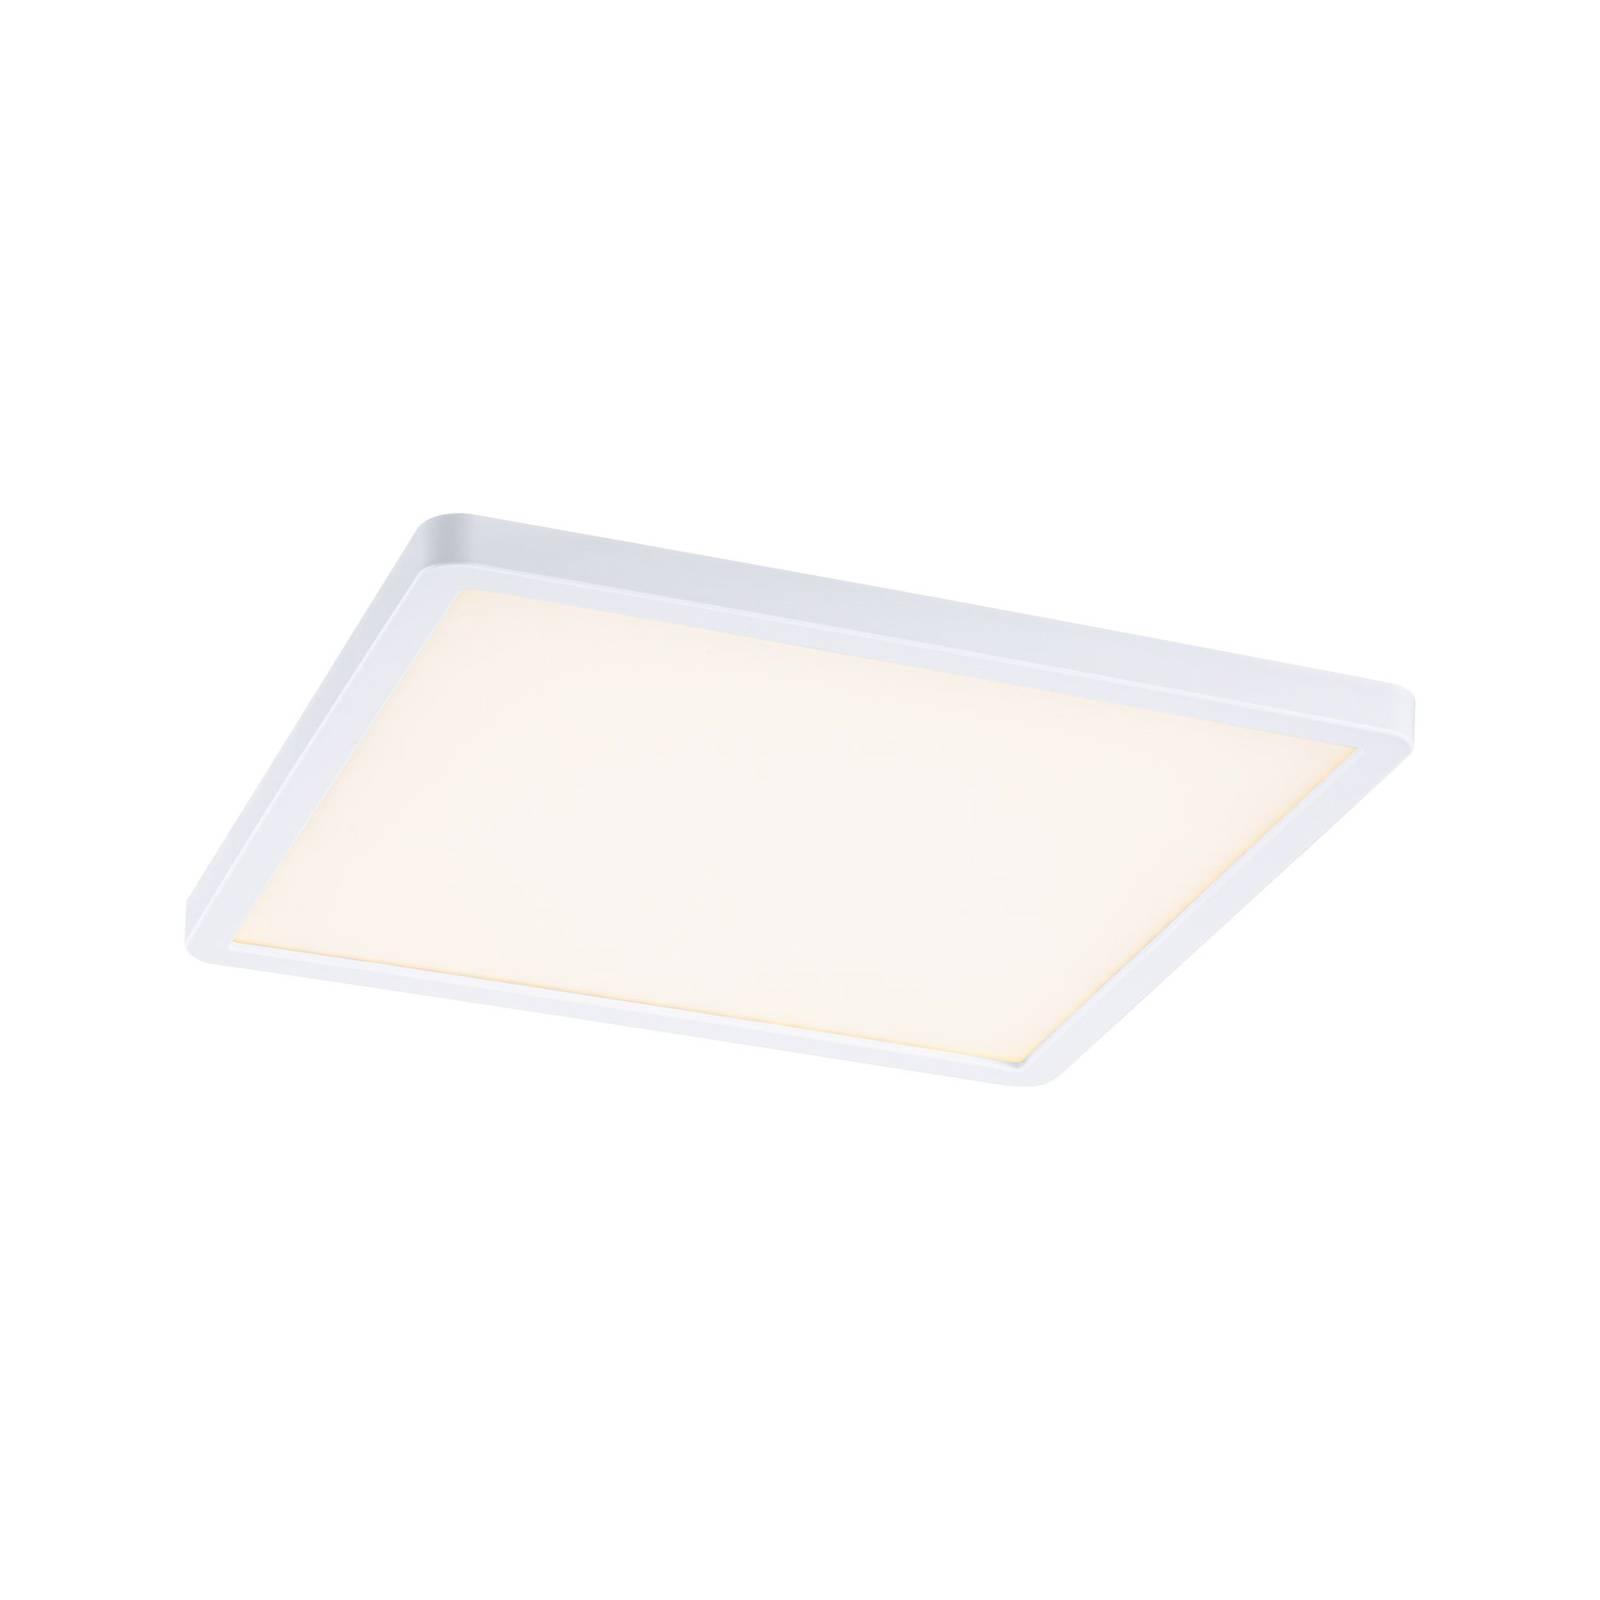 Paulmann LED-Panel Areo ZigBee eckig weiß 23cm